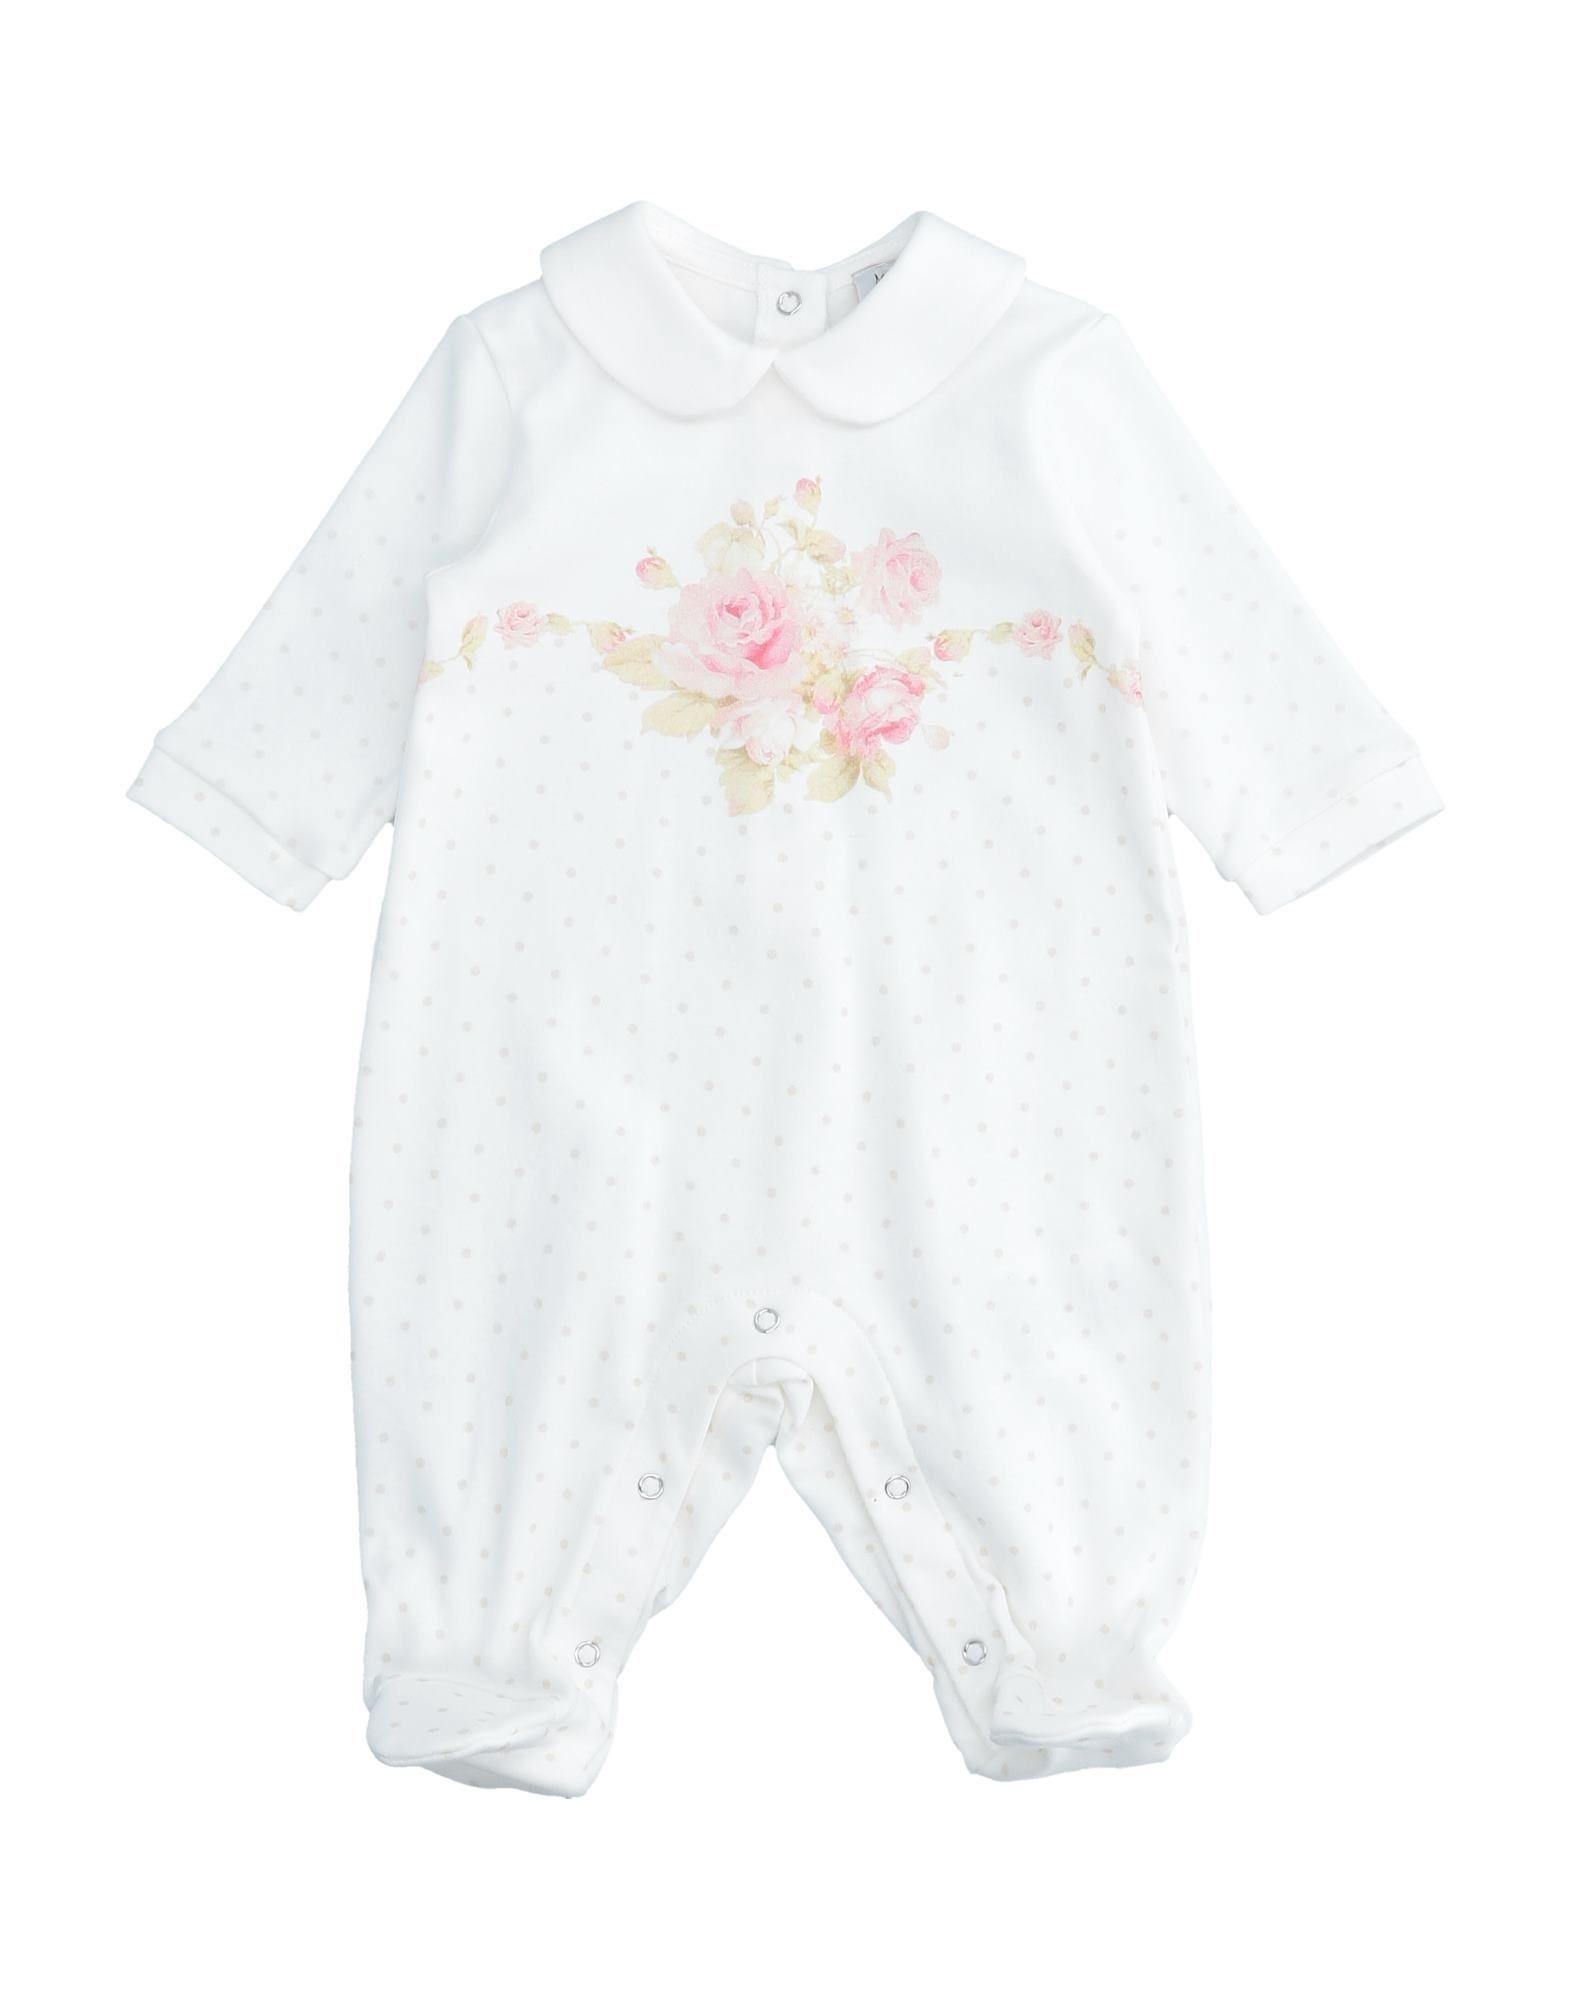 YOOX.COM(ユークス)《セール開催中》MONNALISA ガールズ 0-24 ヶ月 乳幼児用ロンパース ホワイト 6 コットン 100%